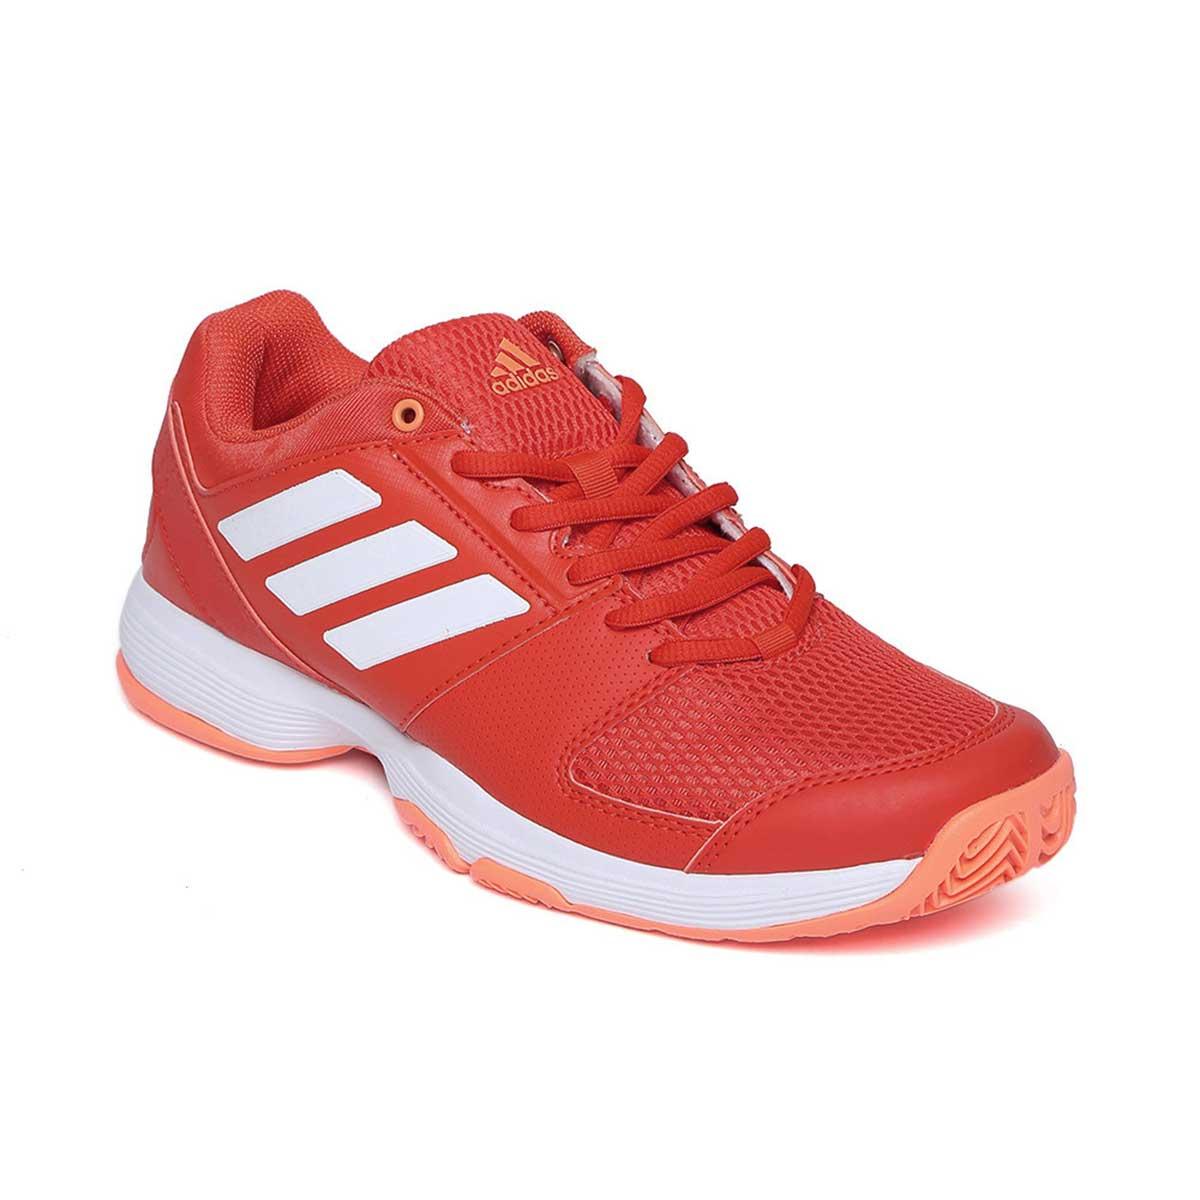 276a79b4010 Adidas Barricade Court Women Tennis Shoes (Orange)